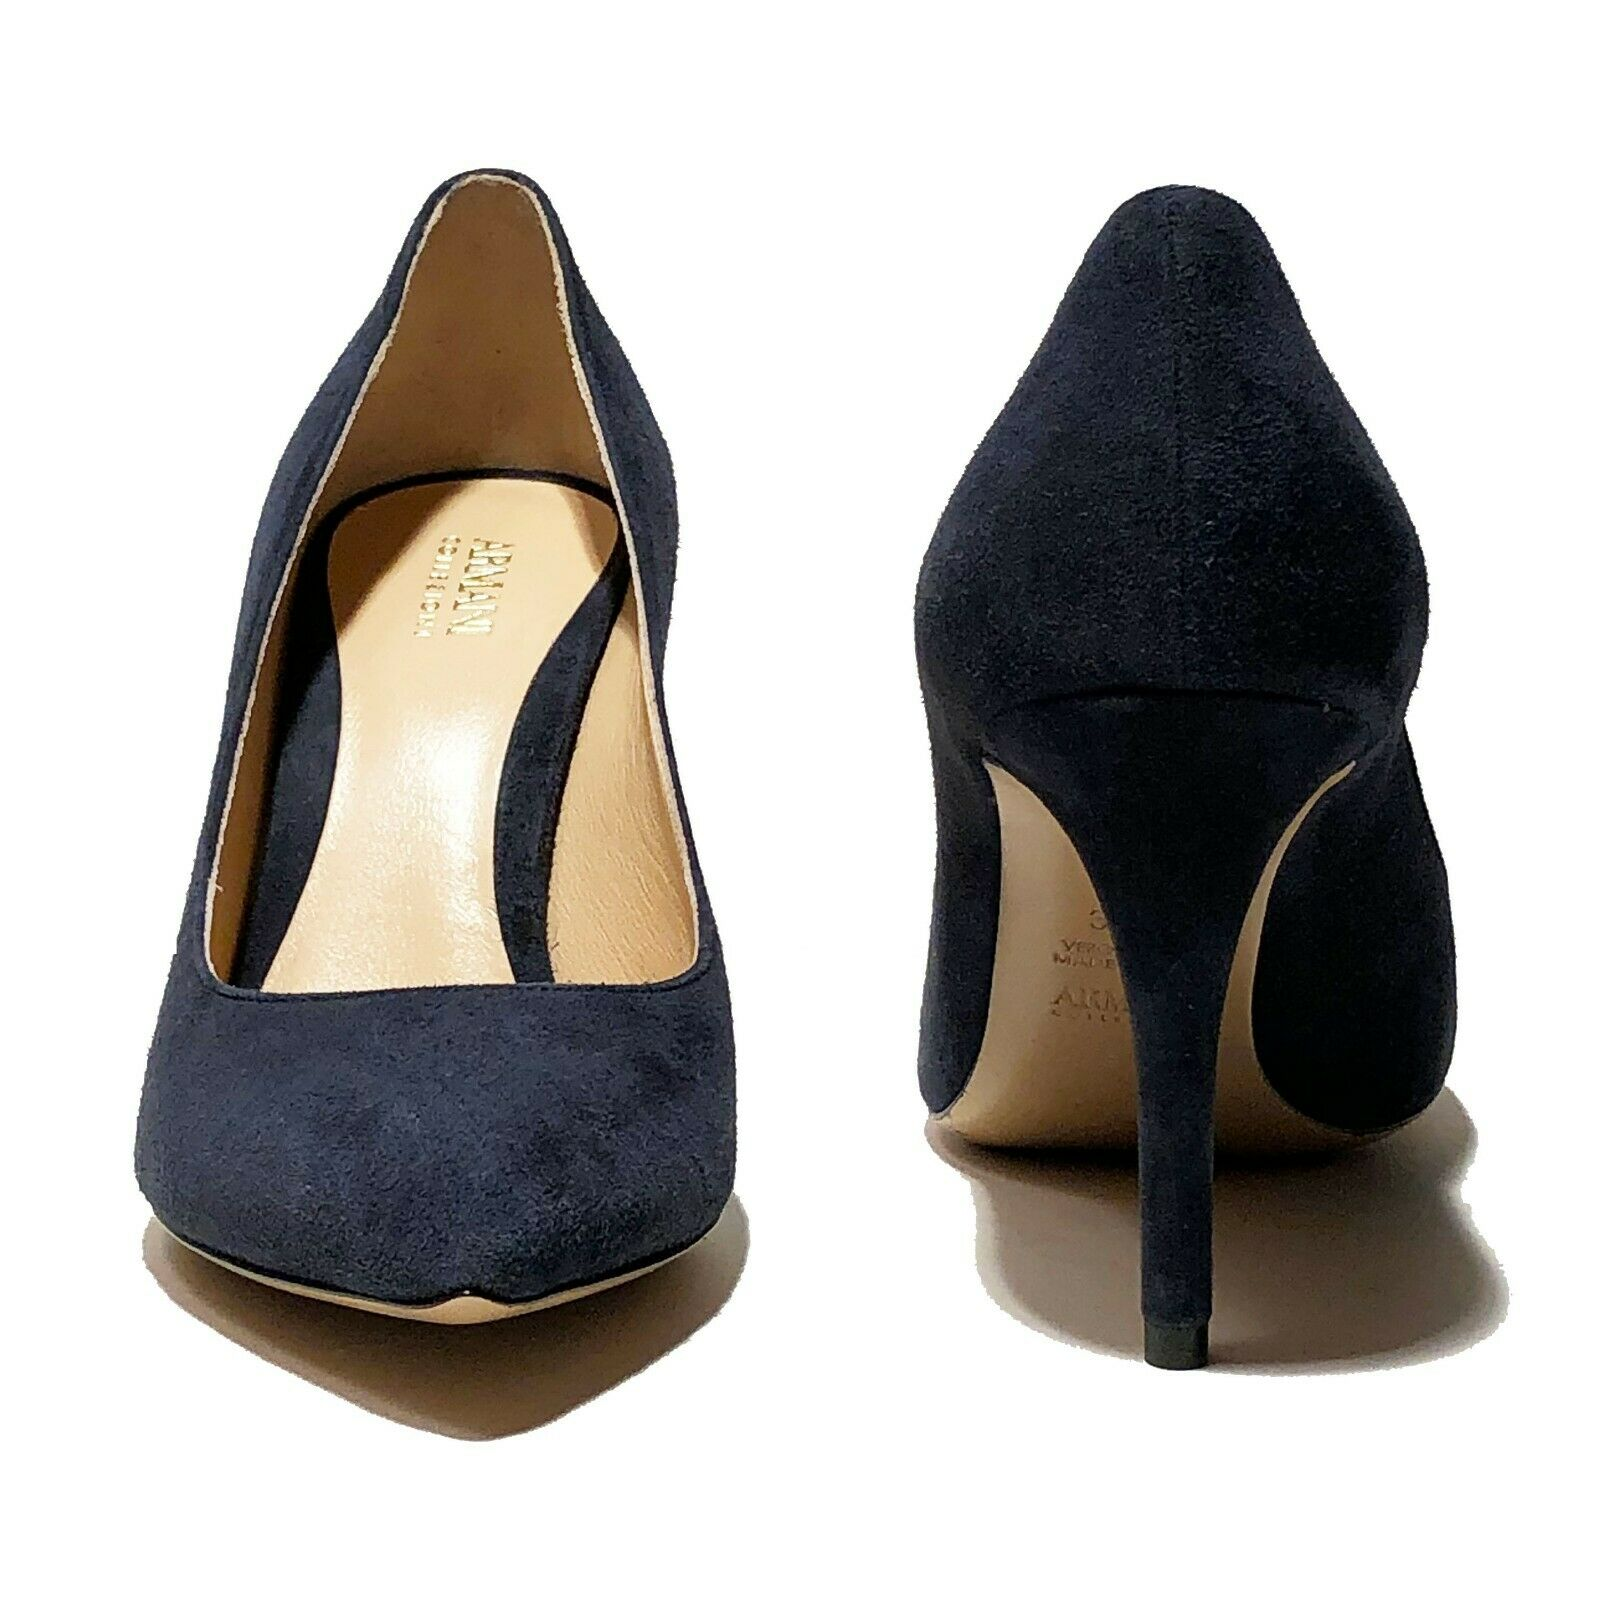 695 Armani Armani Armani Women's Navy Suede Leather Fashion Pointed Toe Stiletto Heels Pumps 4de98c